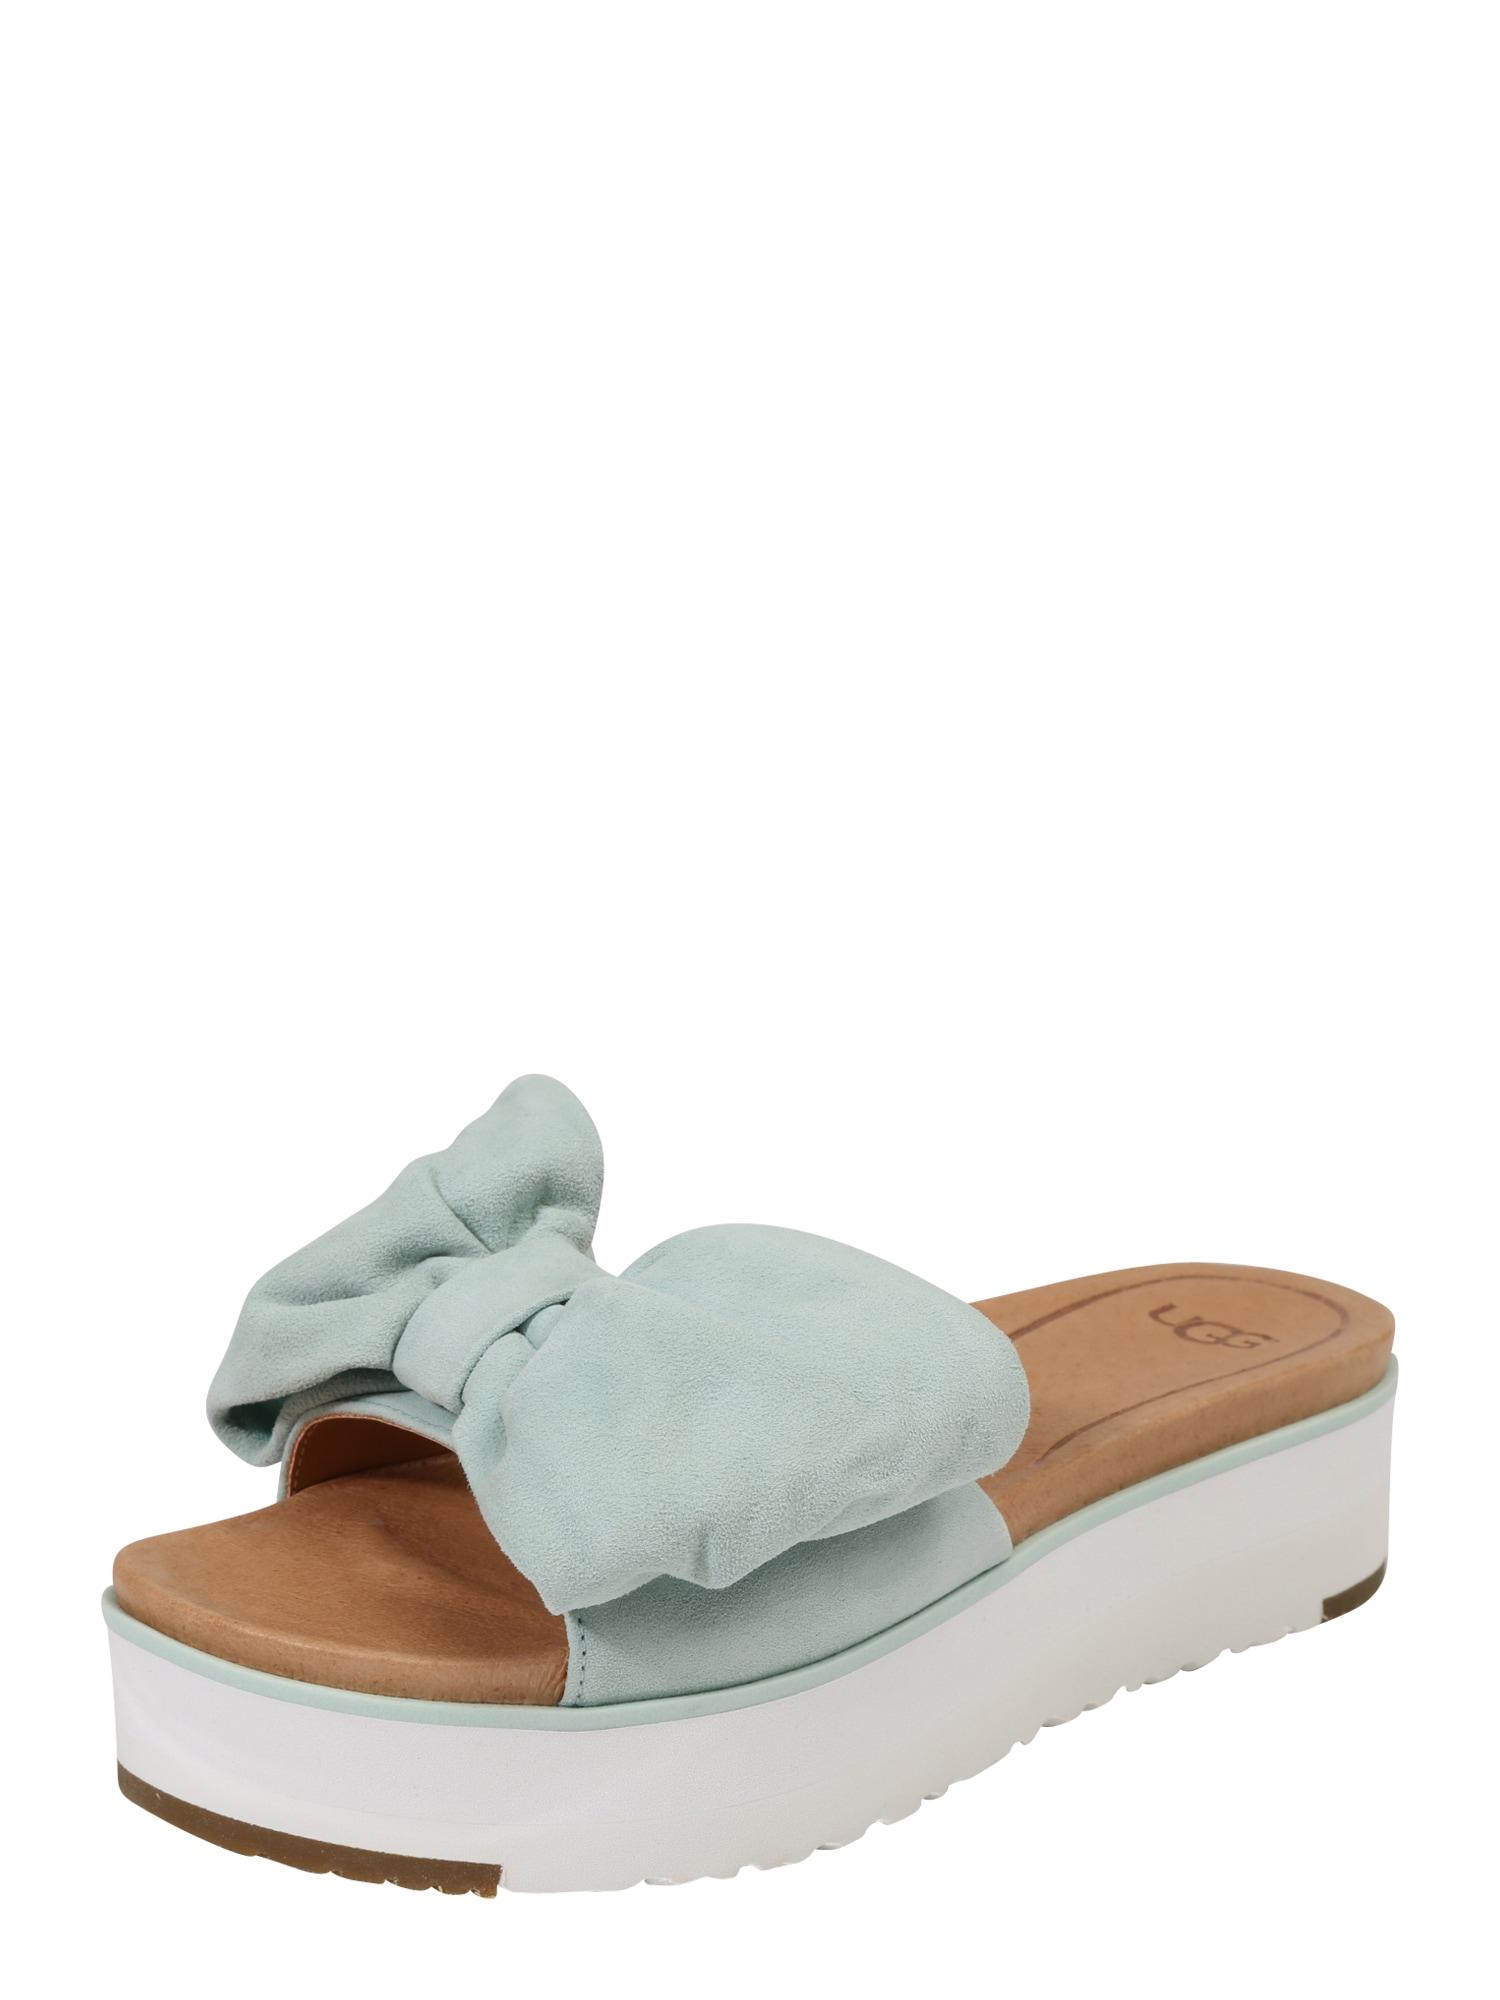 Pantofle Joan aqua modrá UGG